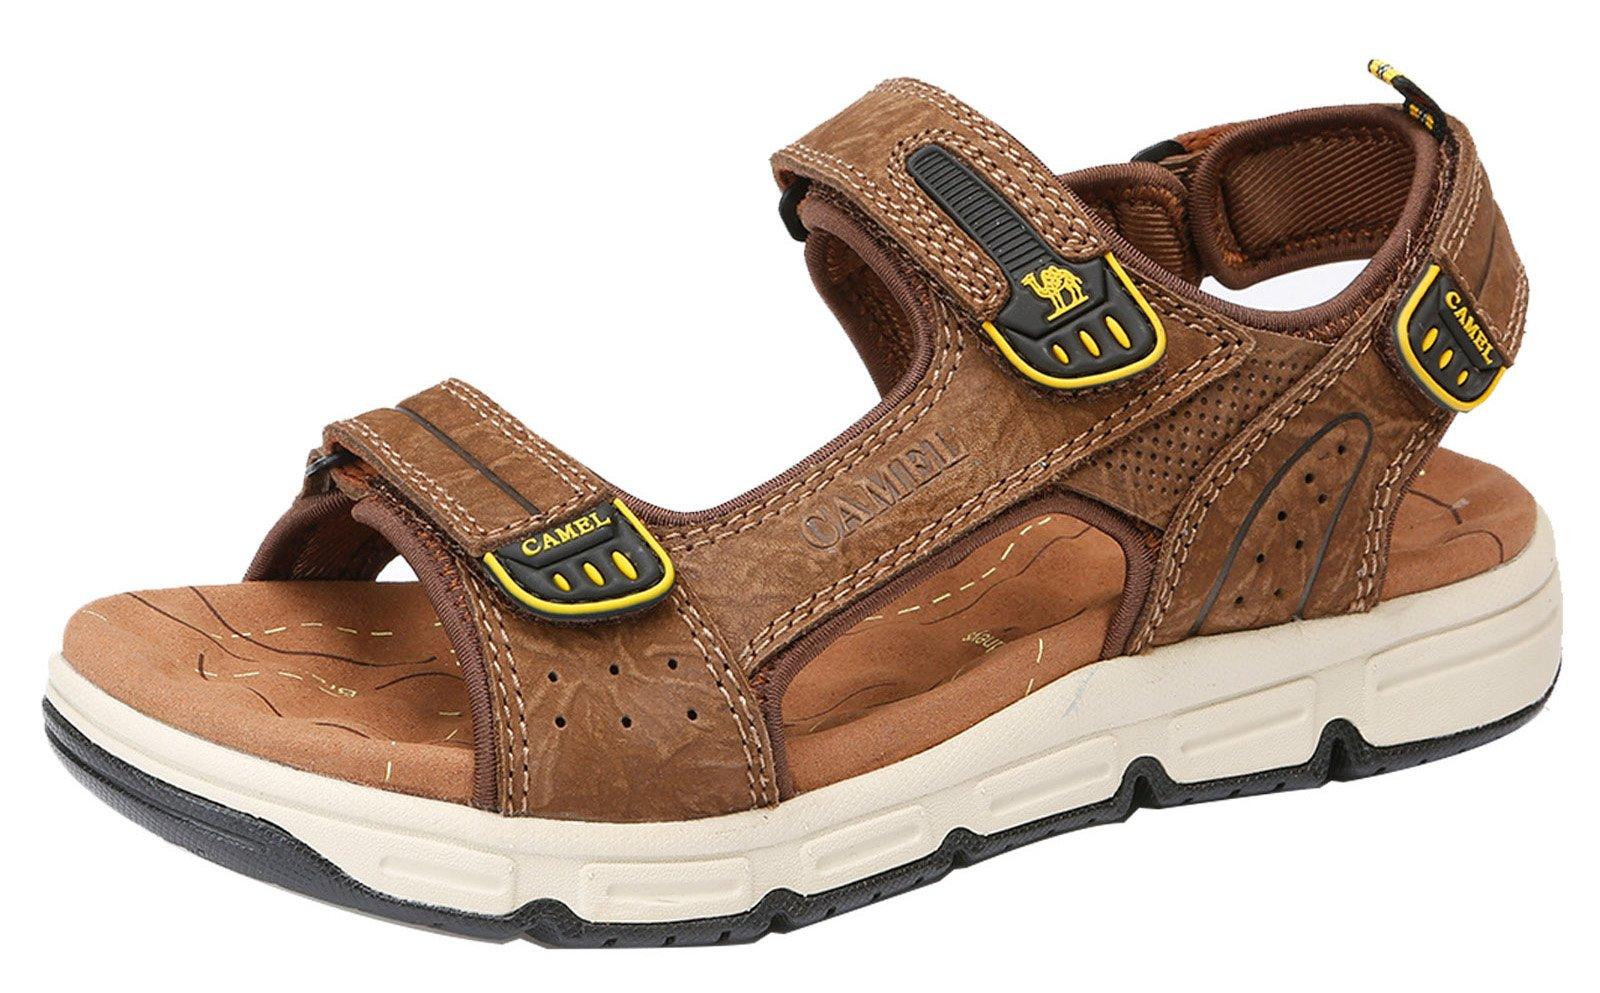 Mens Cowhide Leather Comfort Sport Sandals Outdoor Walking Sandals Beach Waterproof Strap Open Toe Shoes for Men,Dark Brown,250mm